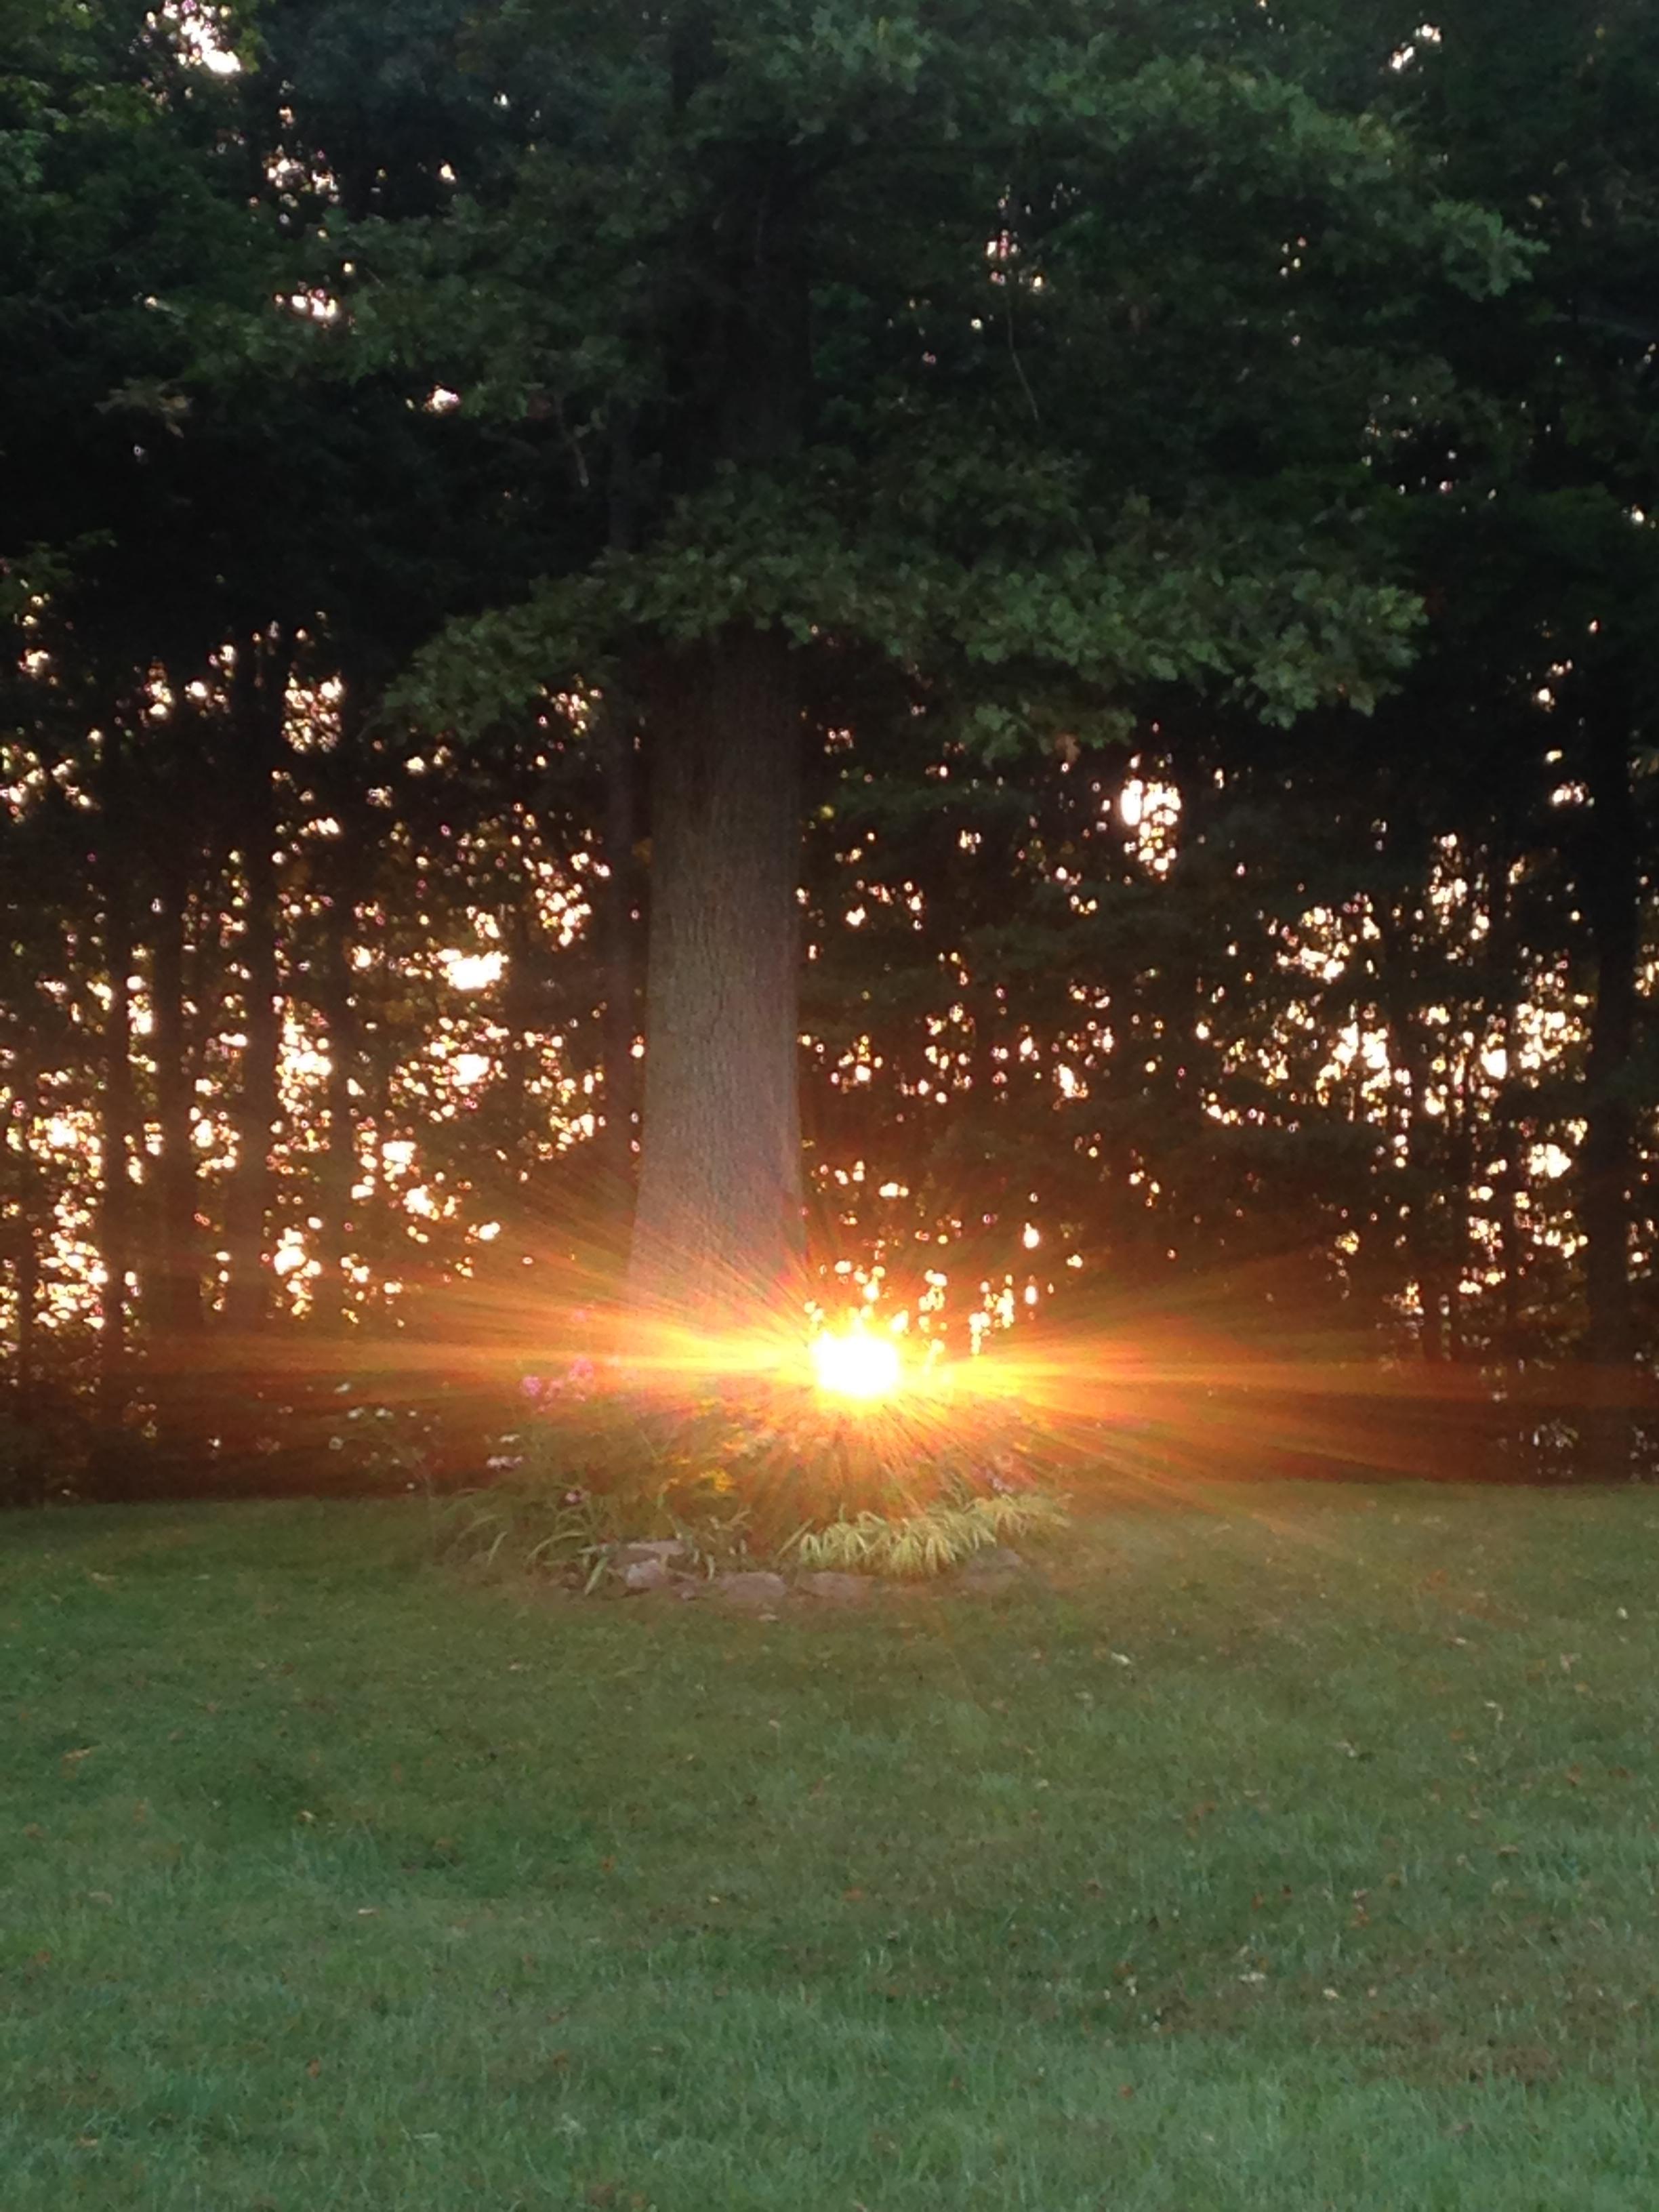 Sunrise at daybreak